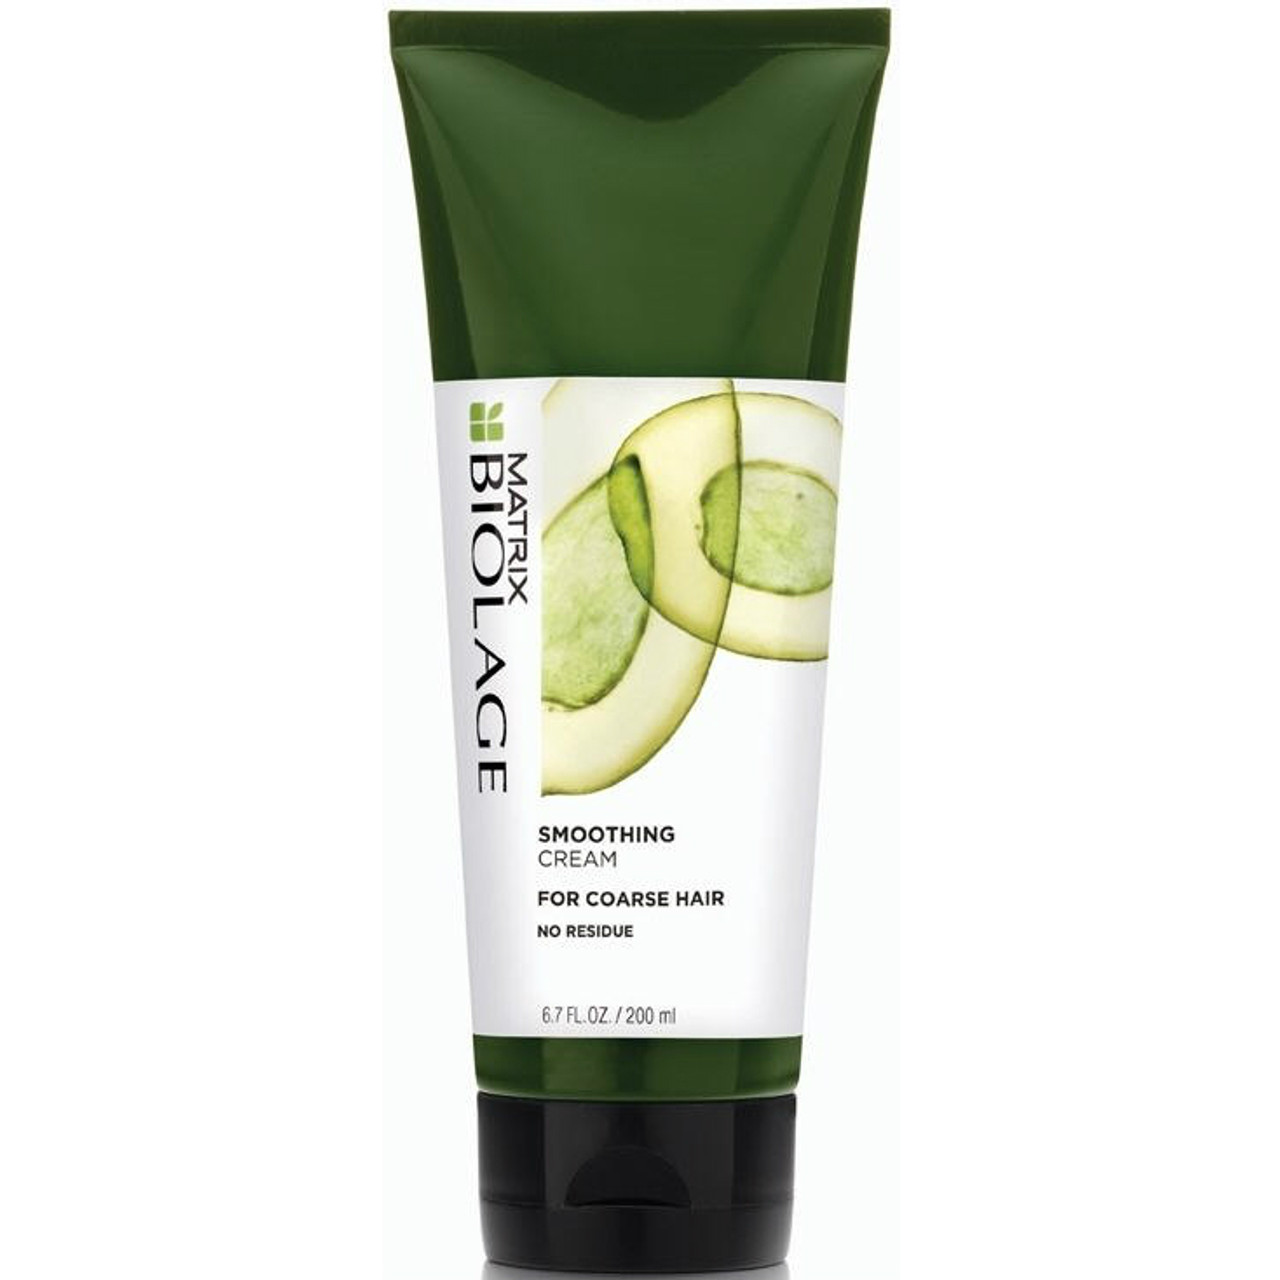 Biolage Smoothing Cream 6.8 oz